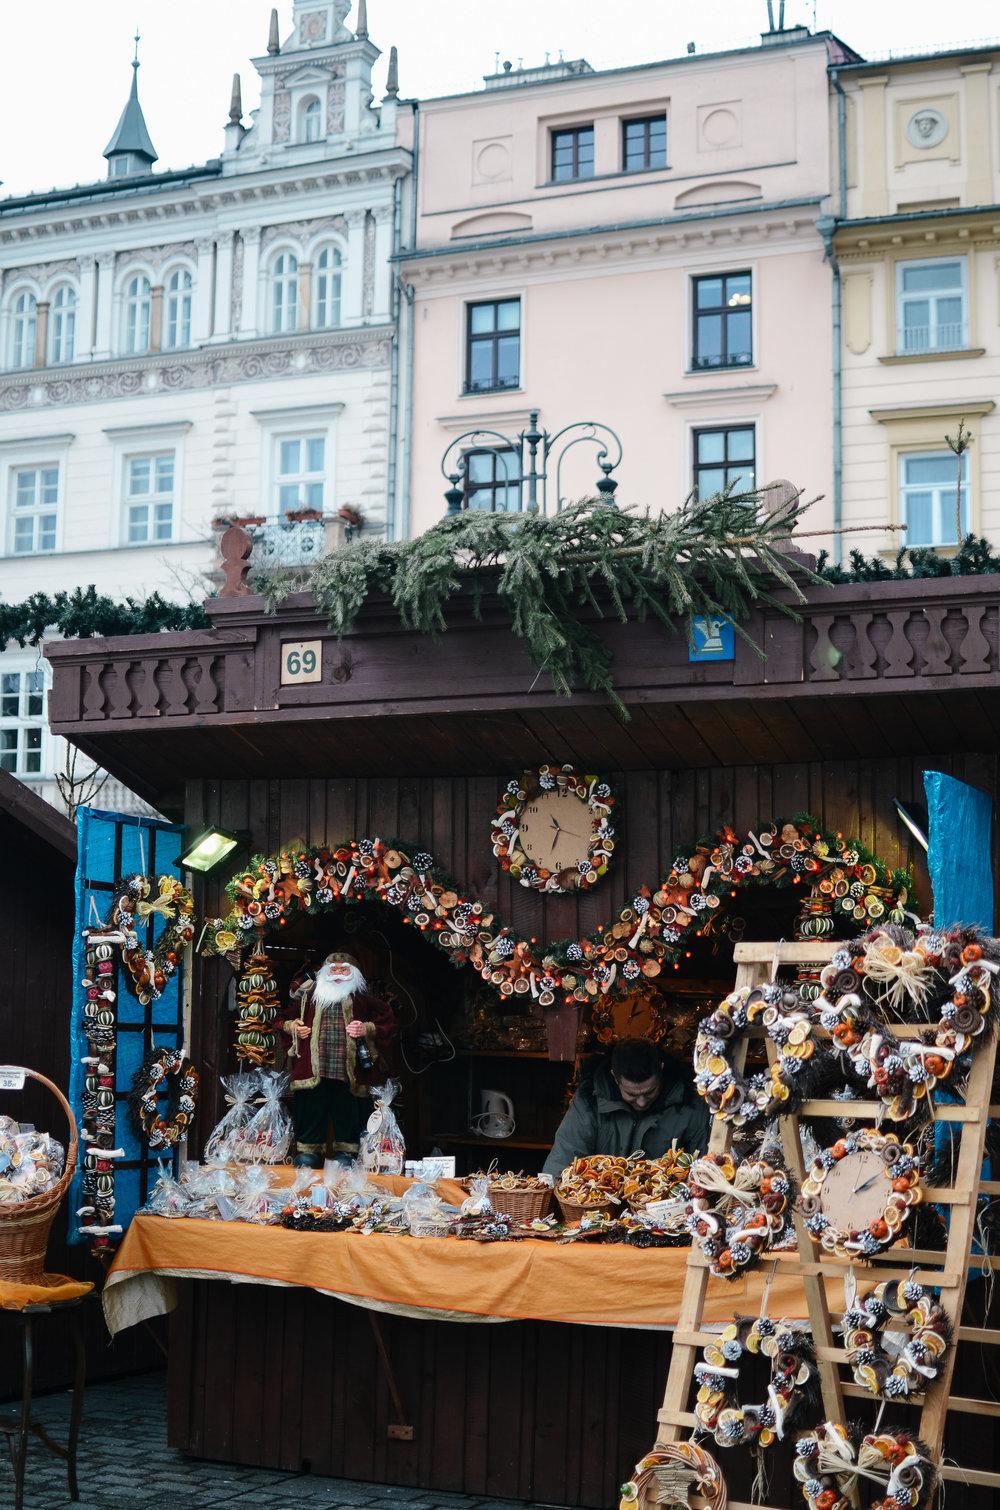 european-christmas-market-travel-guide-lifeonpine_DSC_1073.jpg